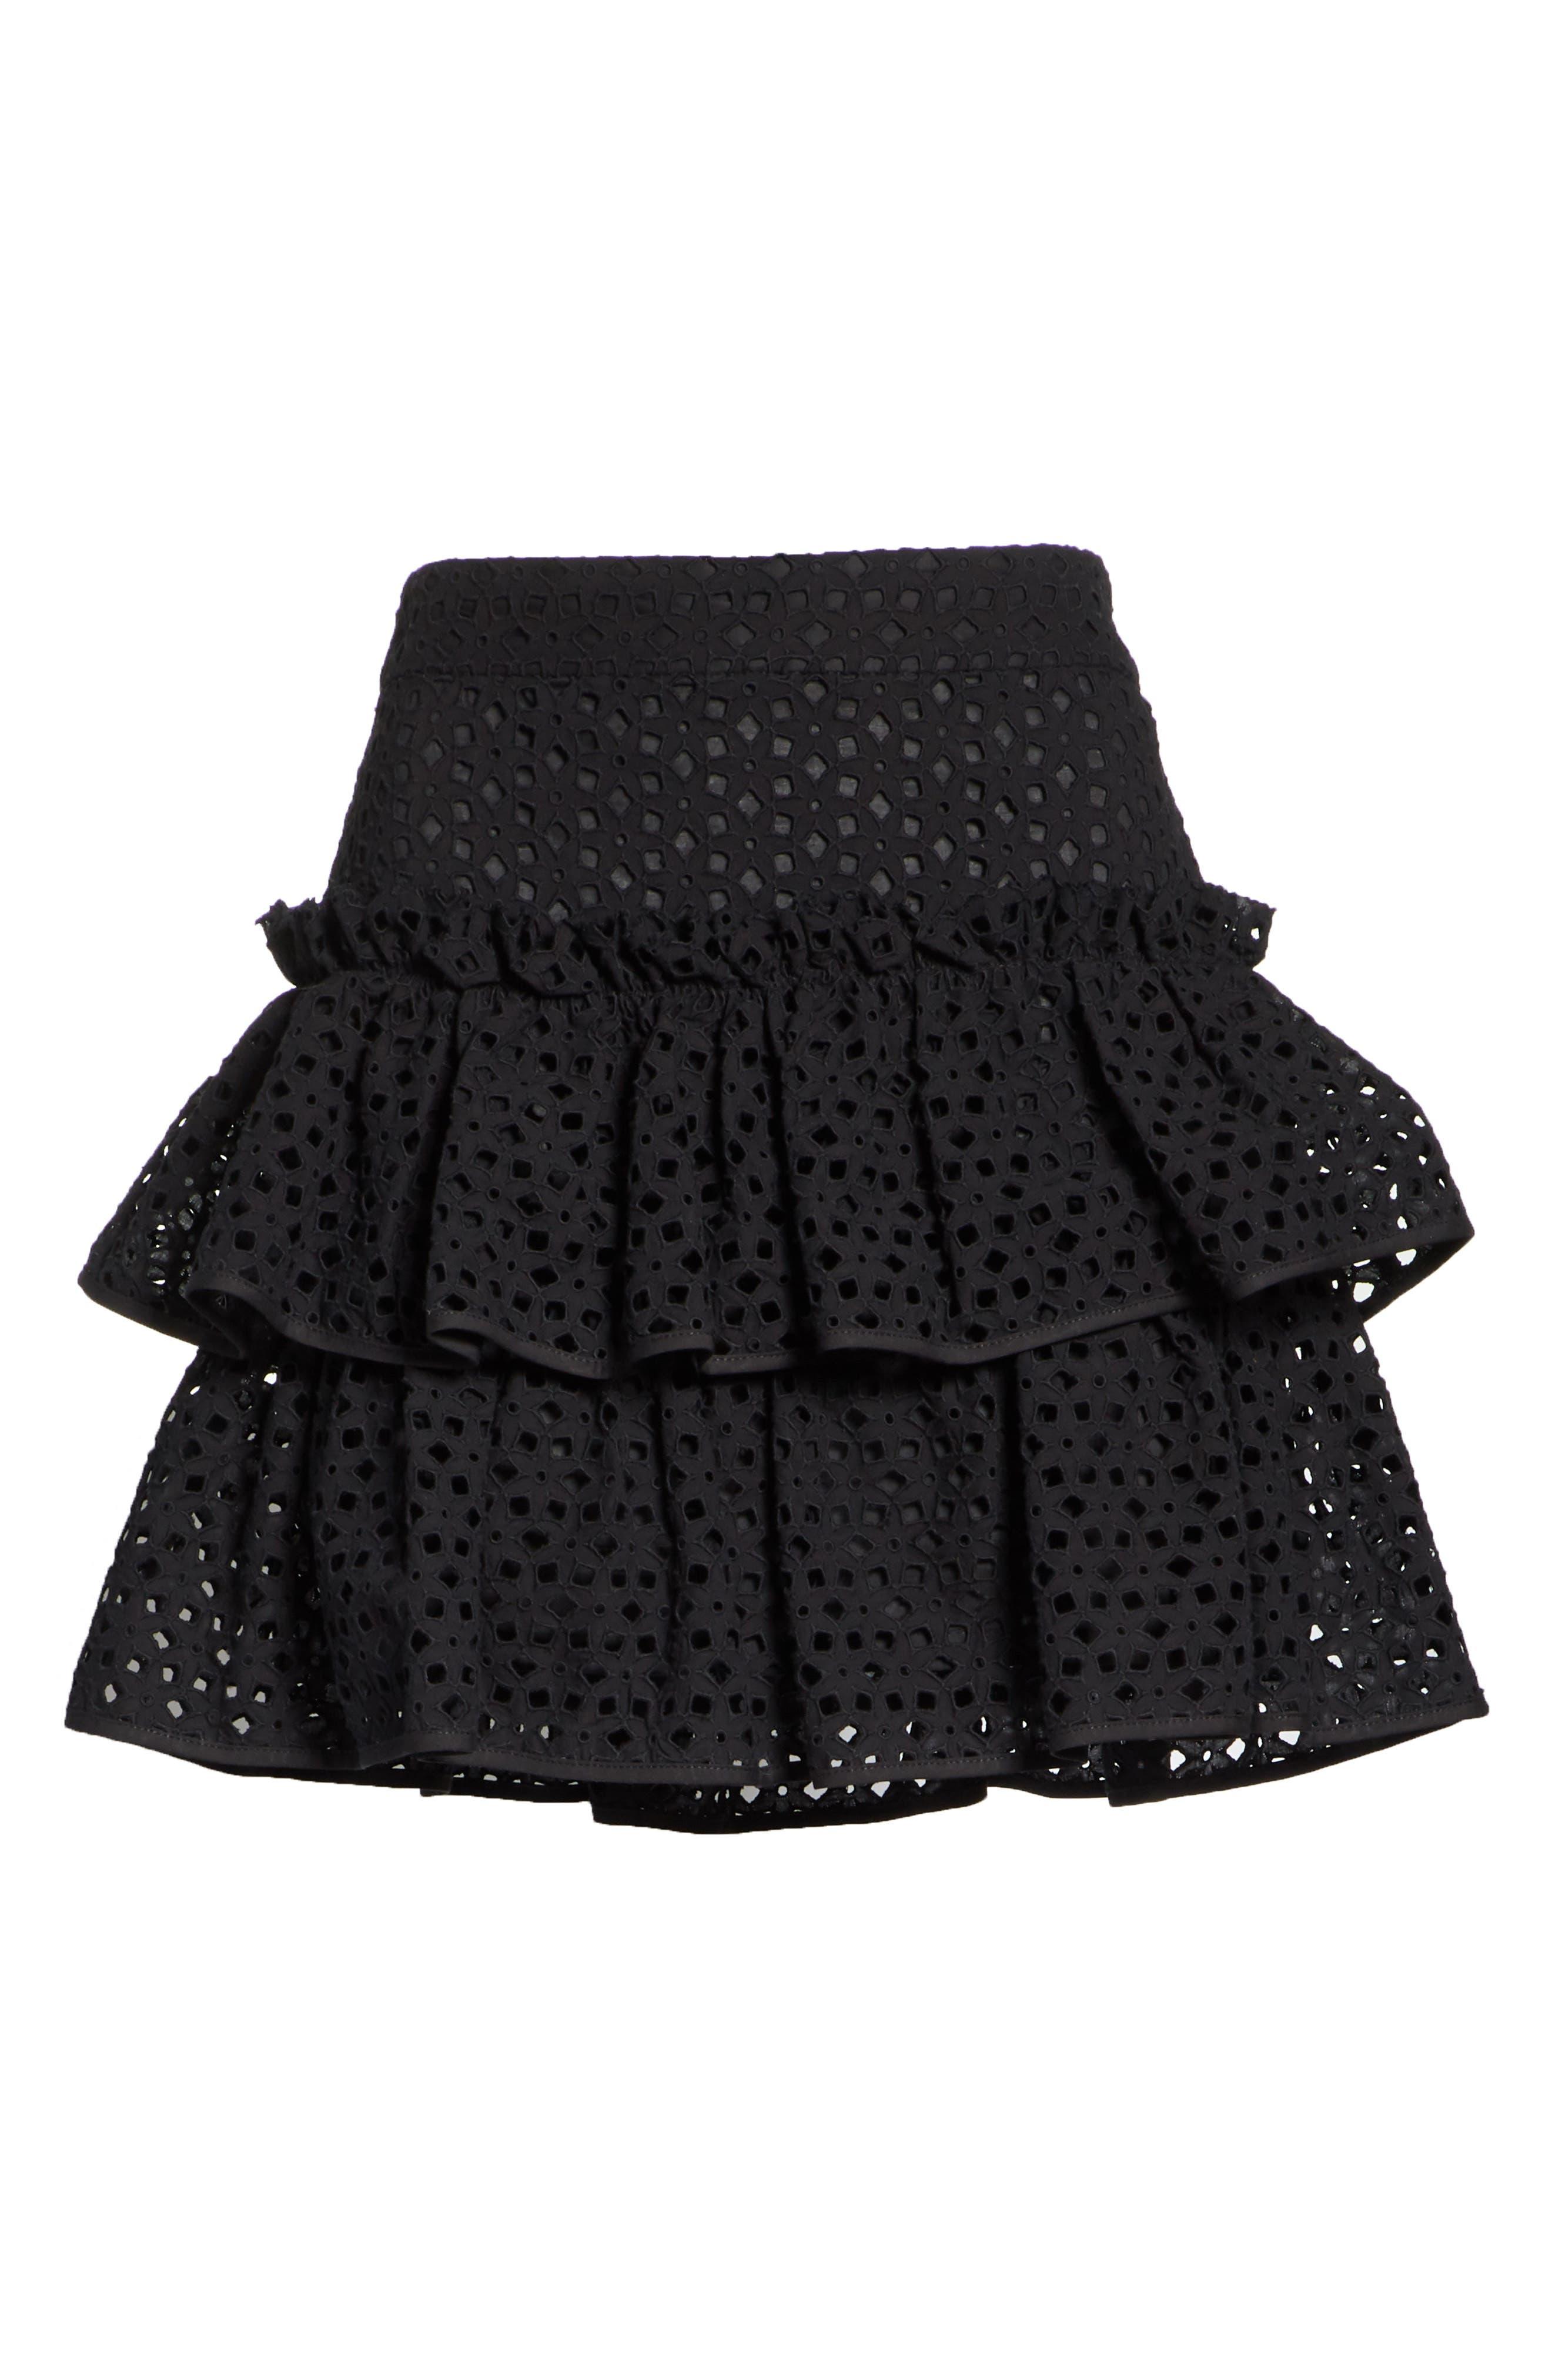 Floral Ruffle Tiered Cotton Eyelet Miniskirt,                             Alternate thumbnail 6, color,                             Black